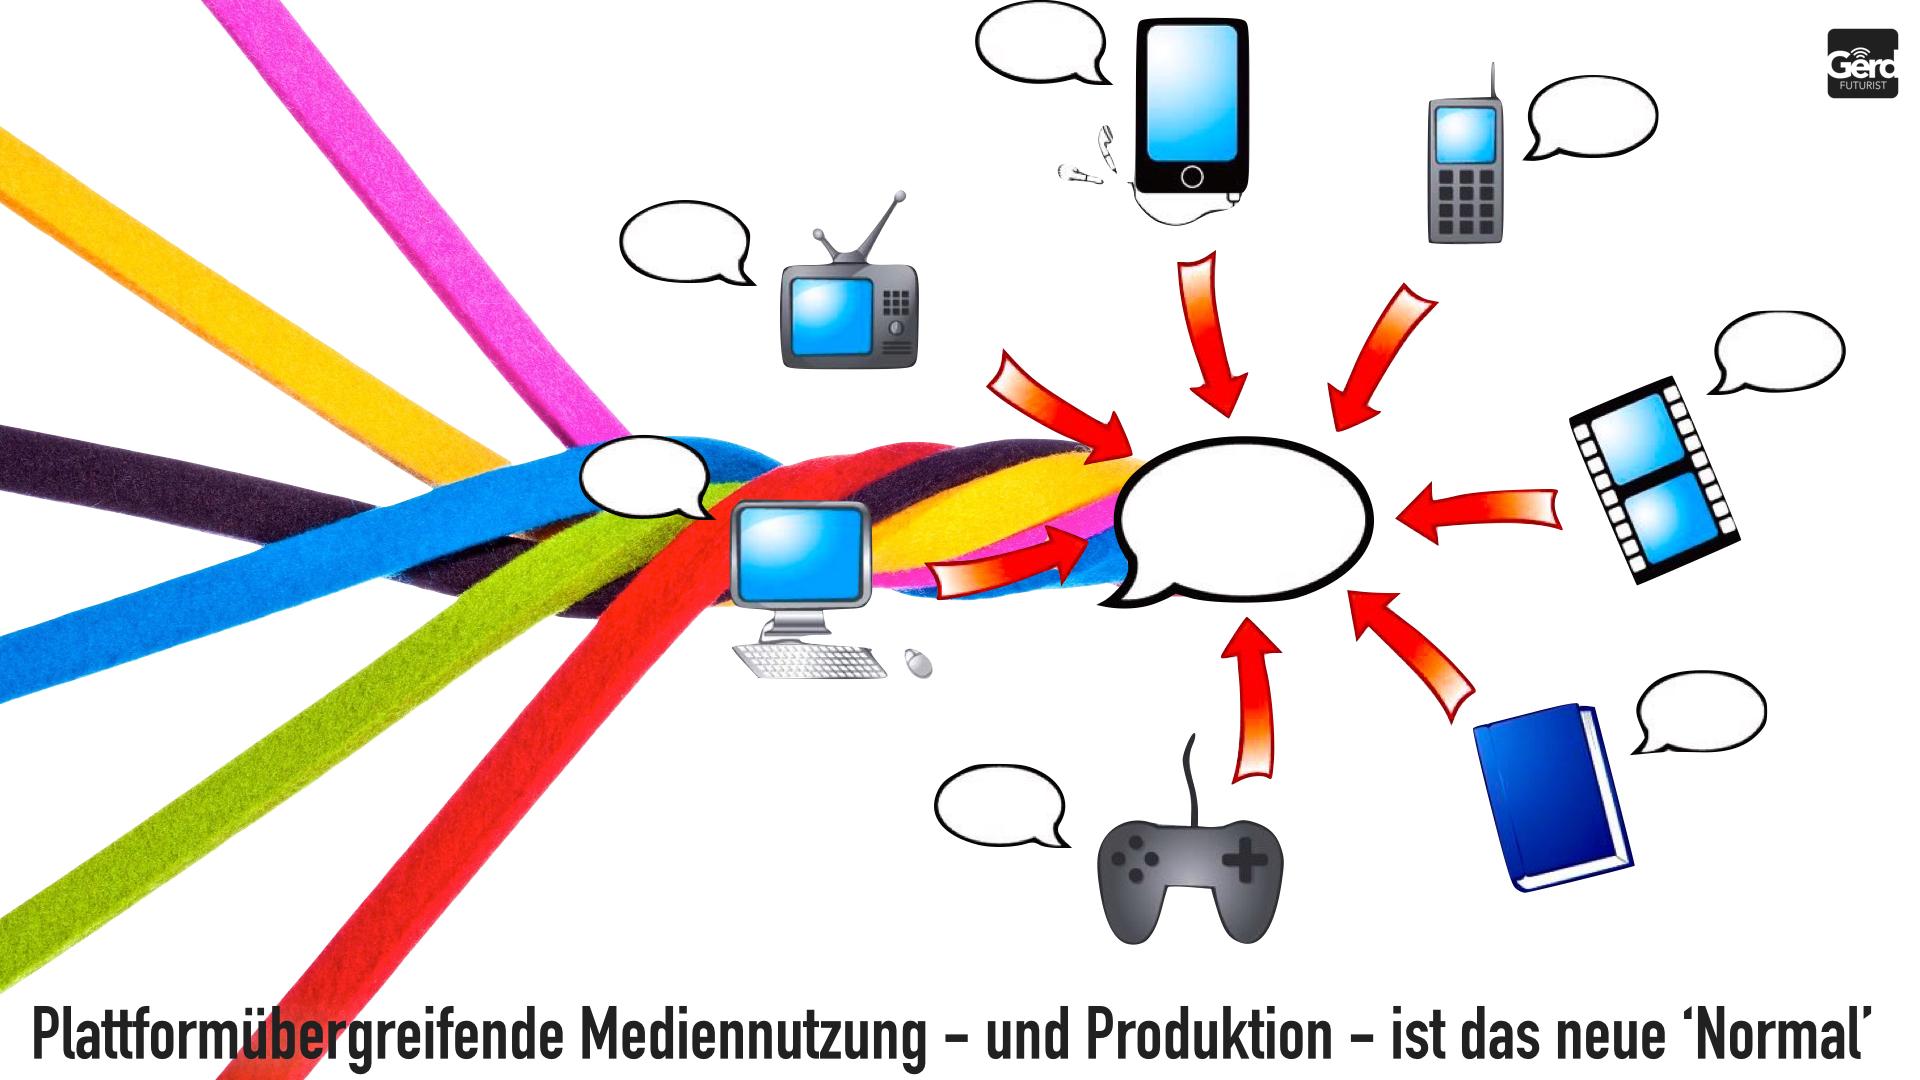 Clipart und medien site clipart library library The Future of Media / Die Zukunft der Medien: the slides from ... clipart library library